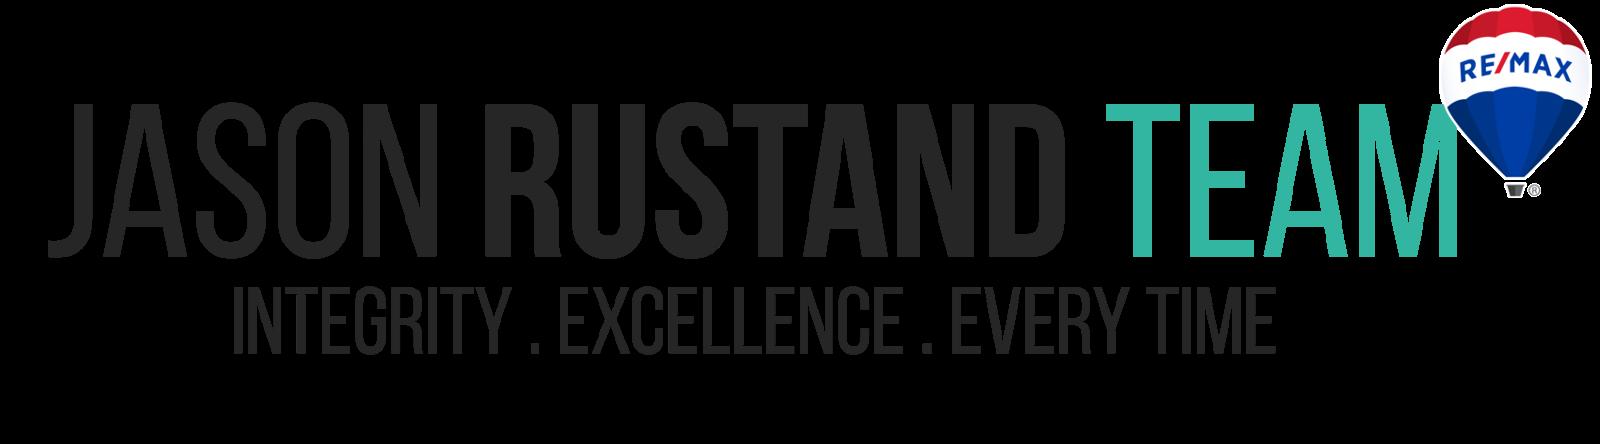 Jason Rustand Team Real Estate